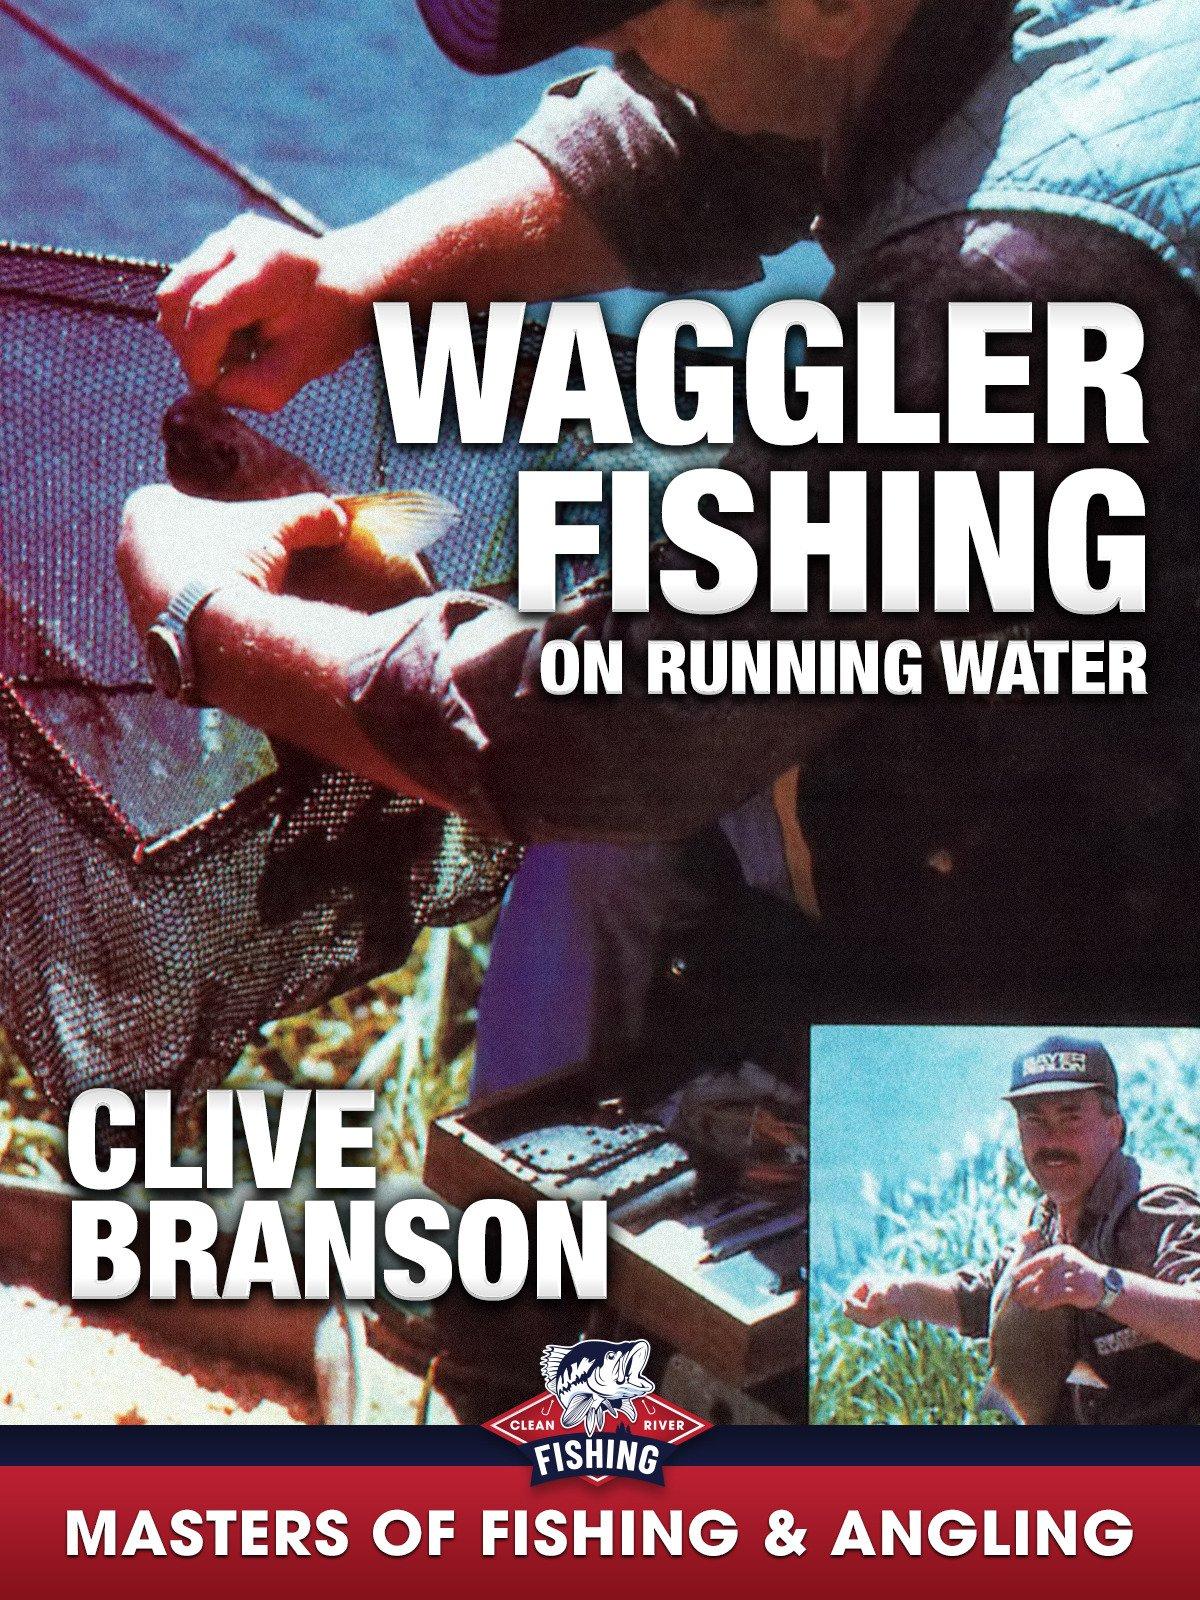 Waggler Fishing on Running Water